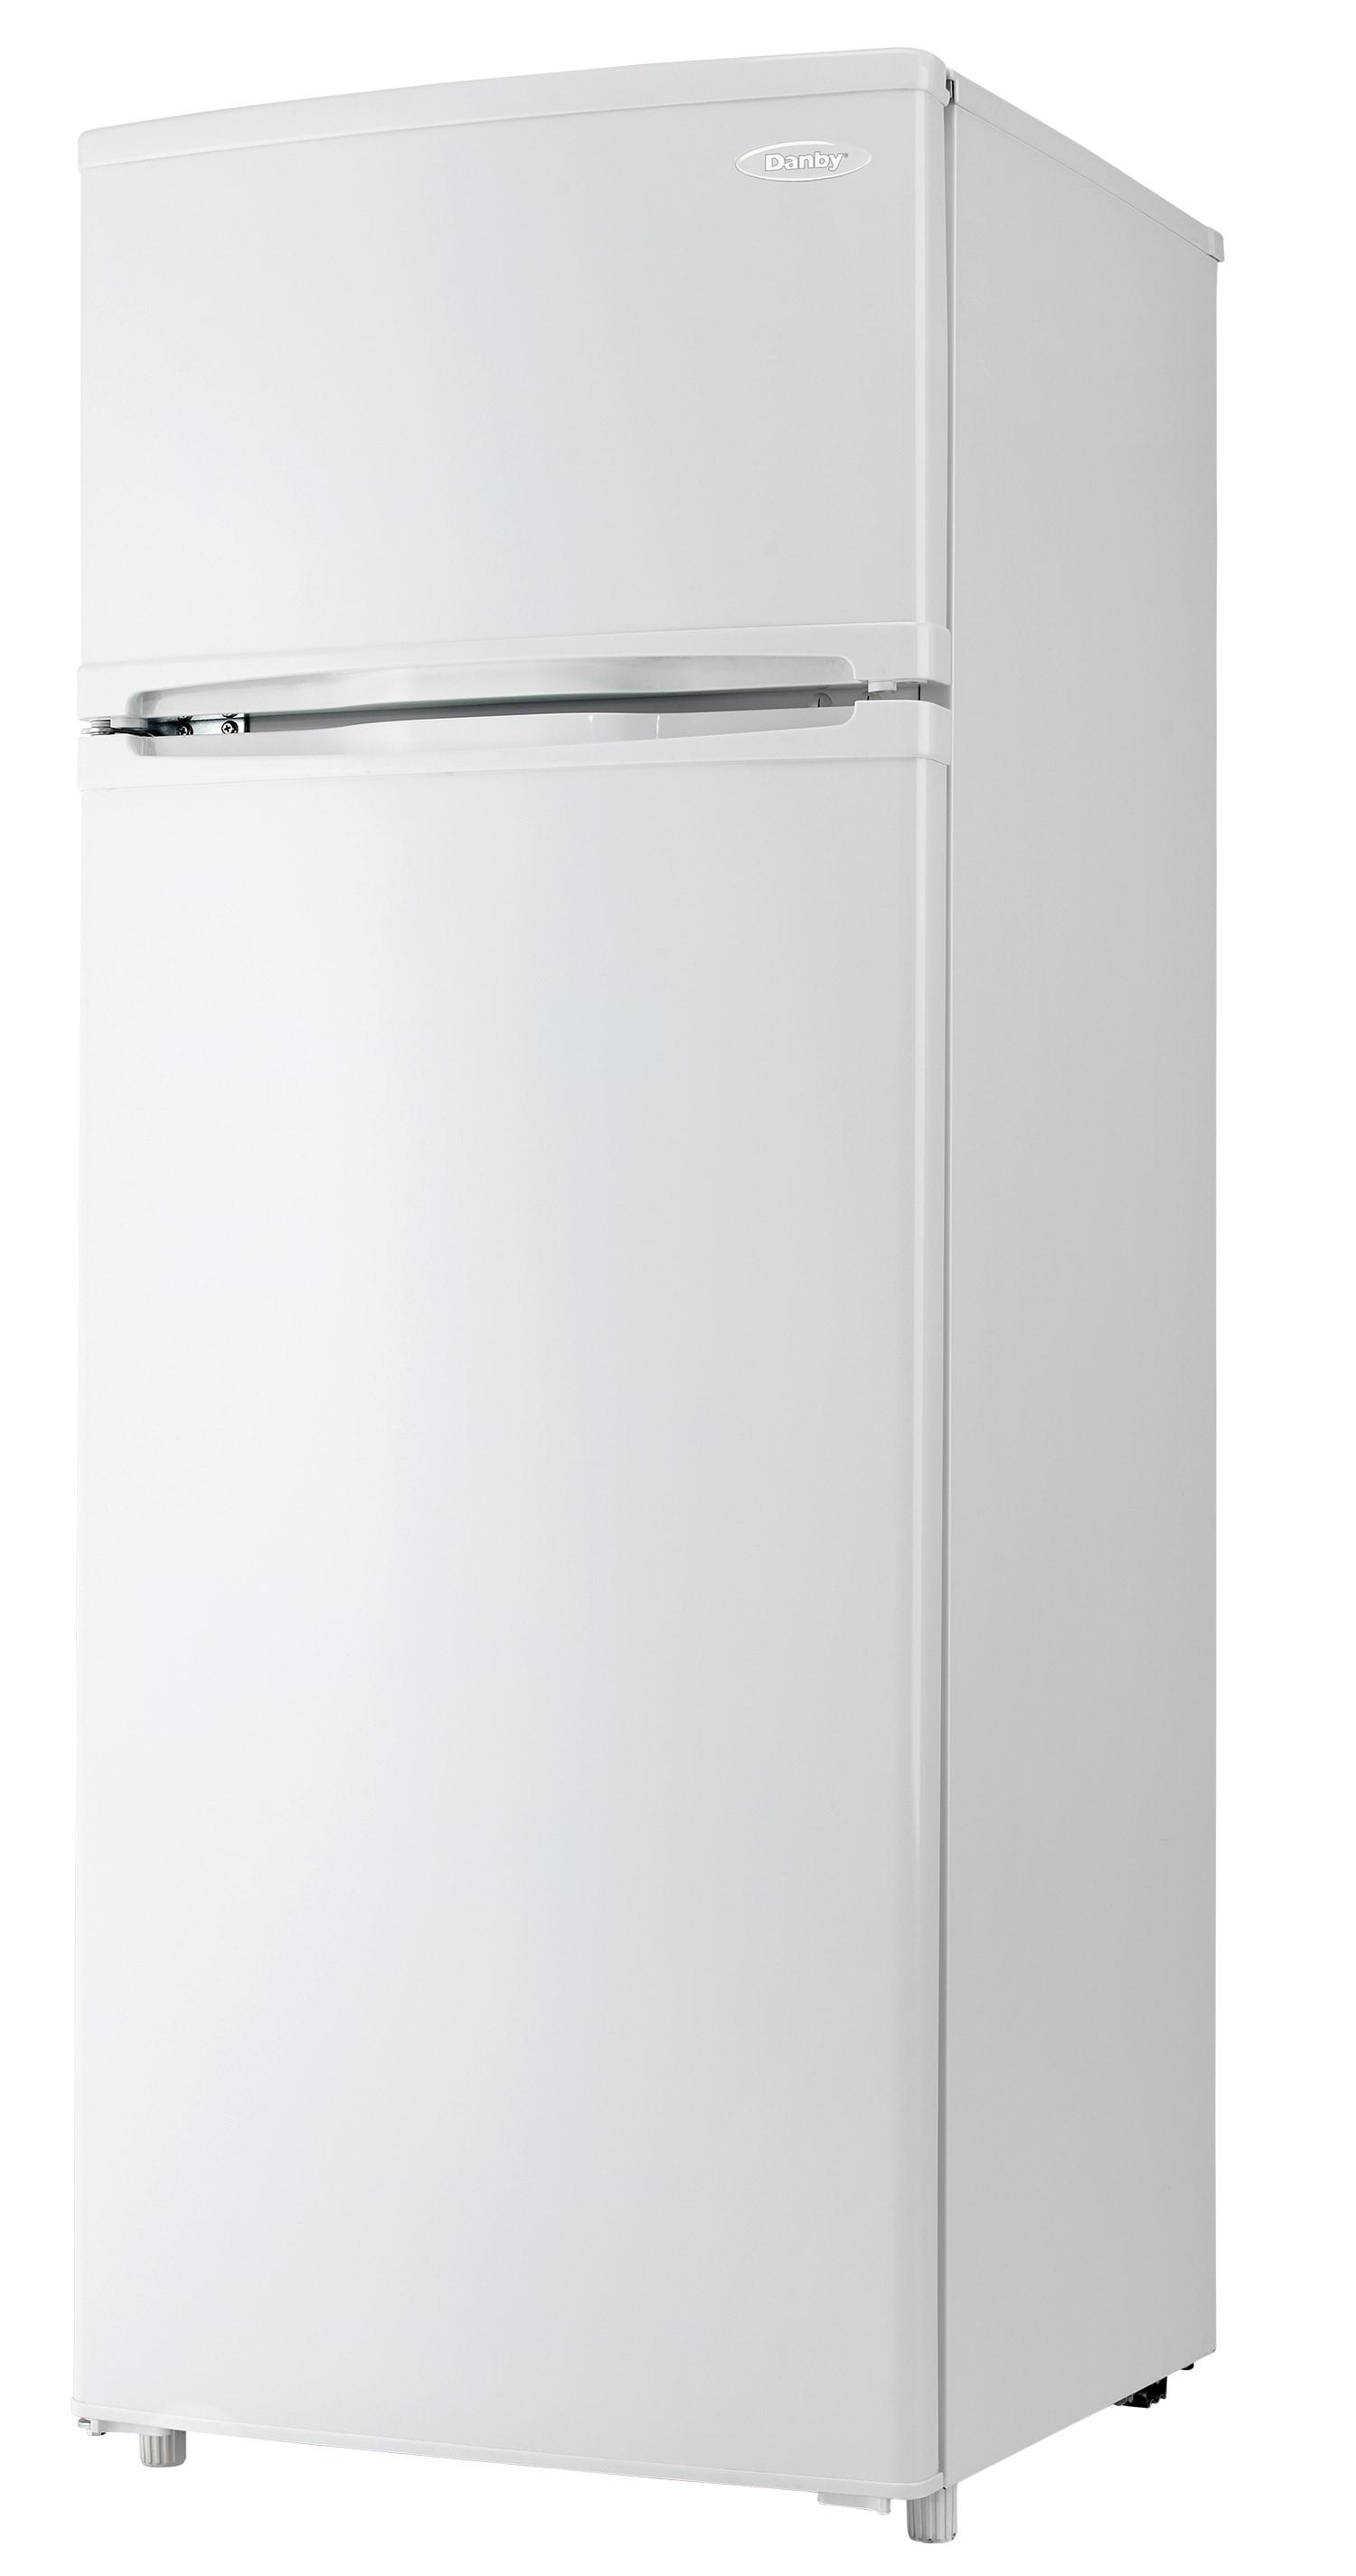 Danby Apartment Size Refrigerator Apartment size refrigerator ...